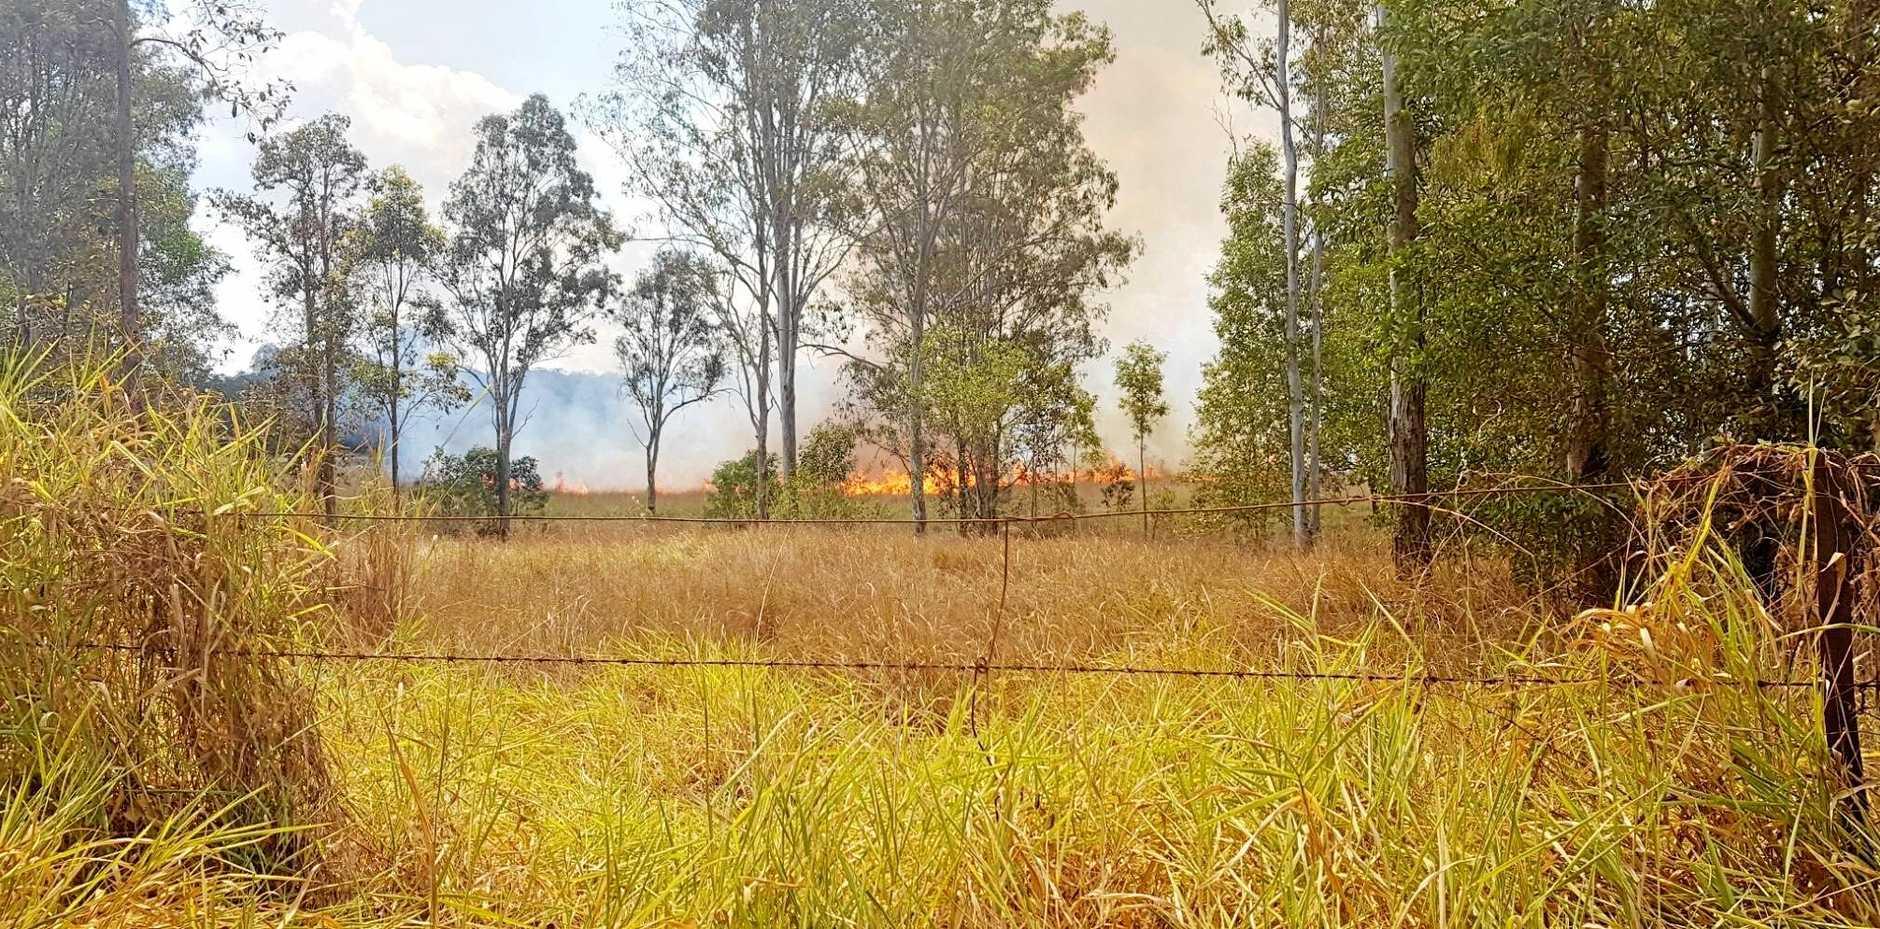 Bushfiree at Imbil.